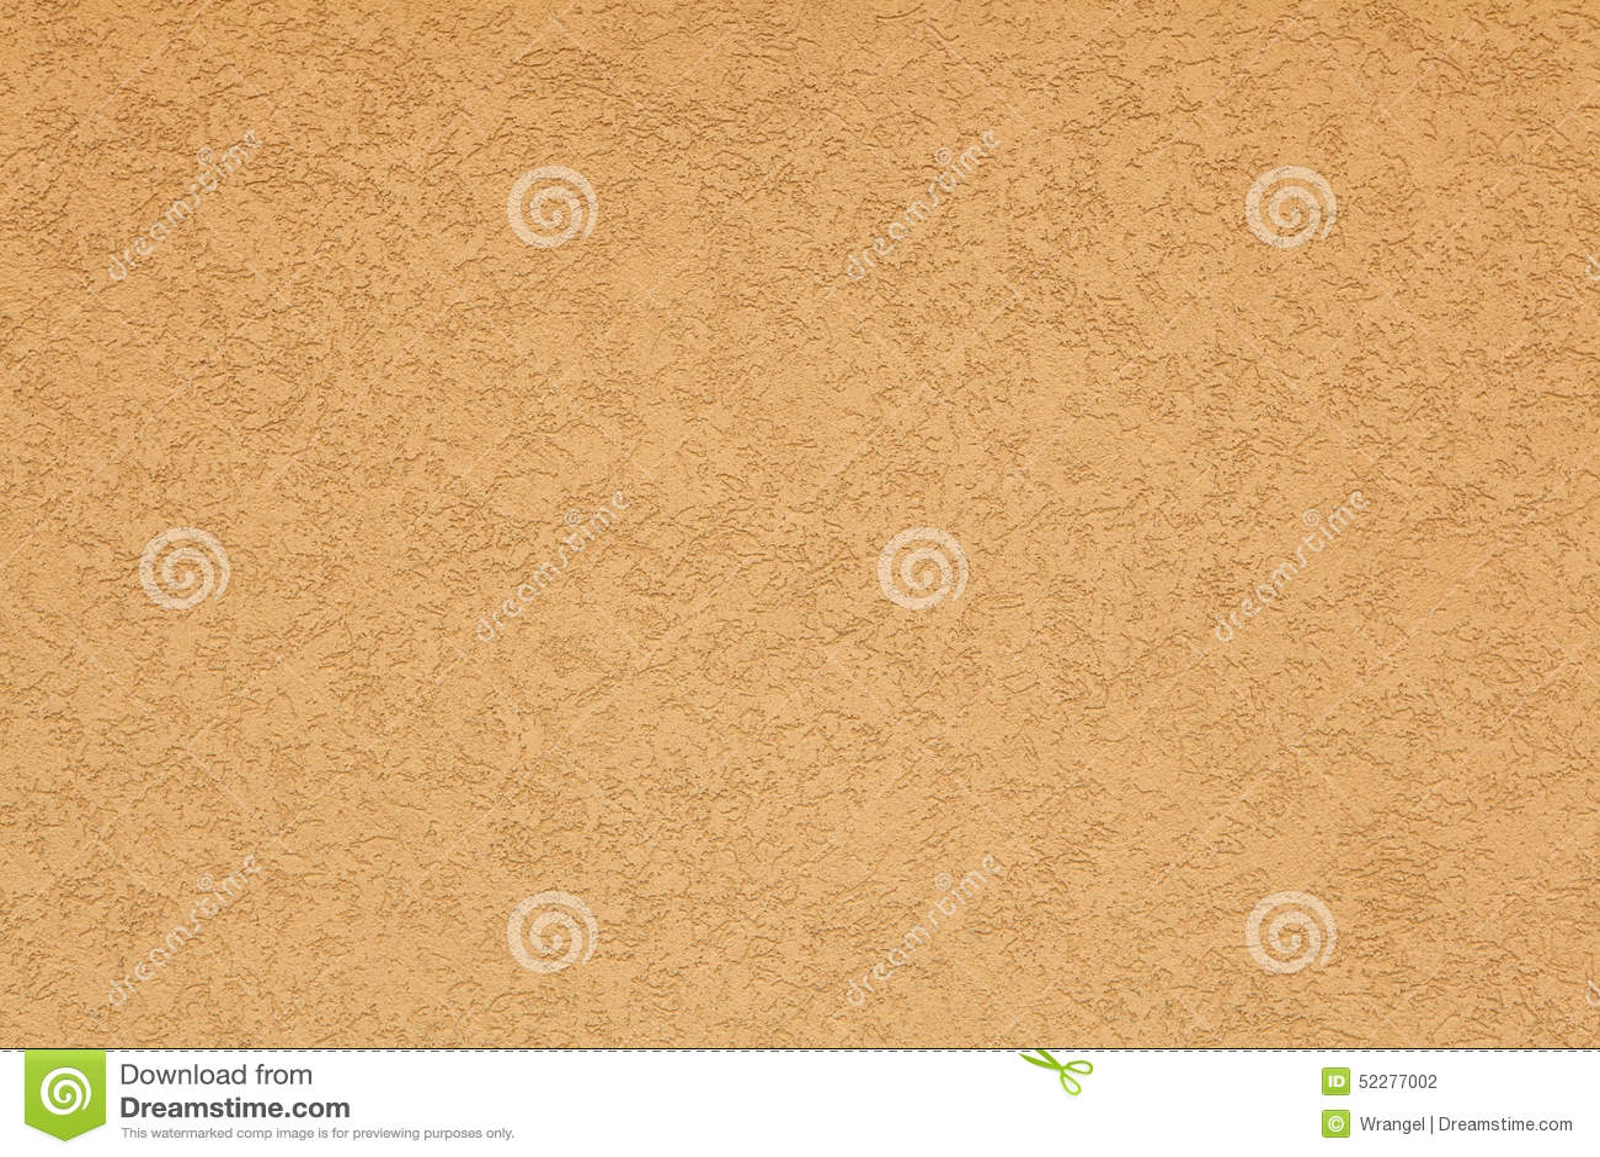 mur de stuc de terre cuite texture de fond photo stock image 52277002. Black Bedroom Furniture Sets. Home Design Ideas